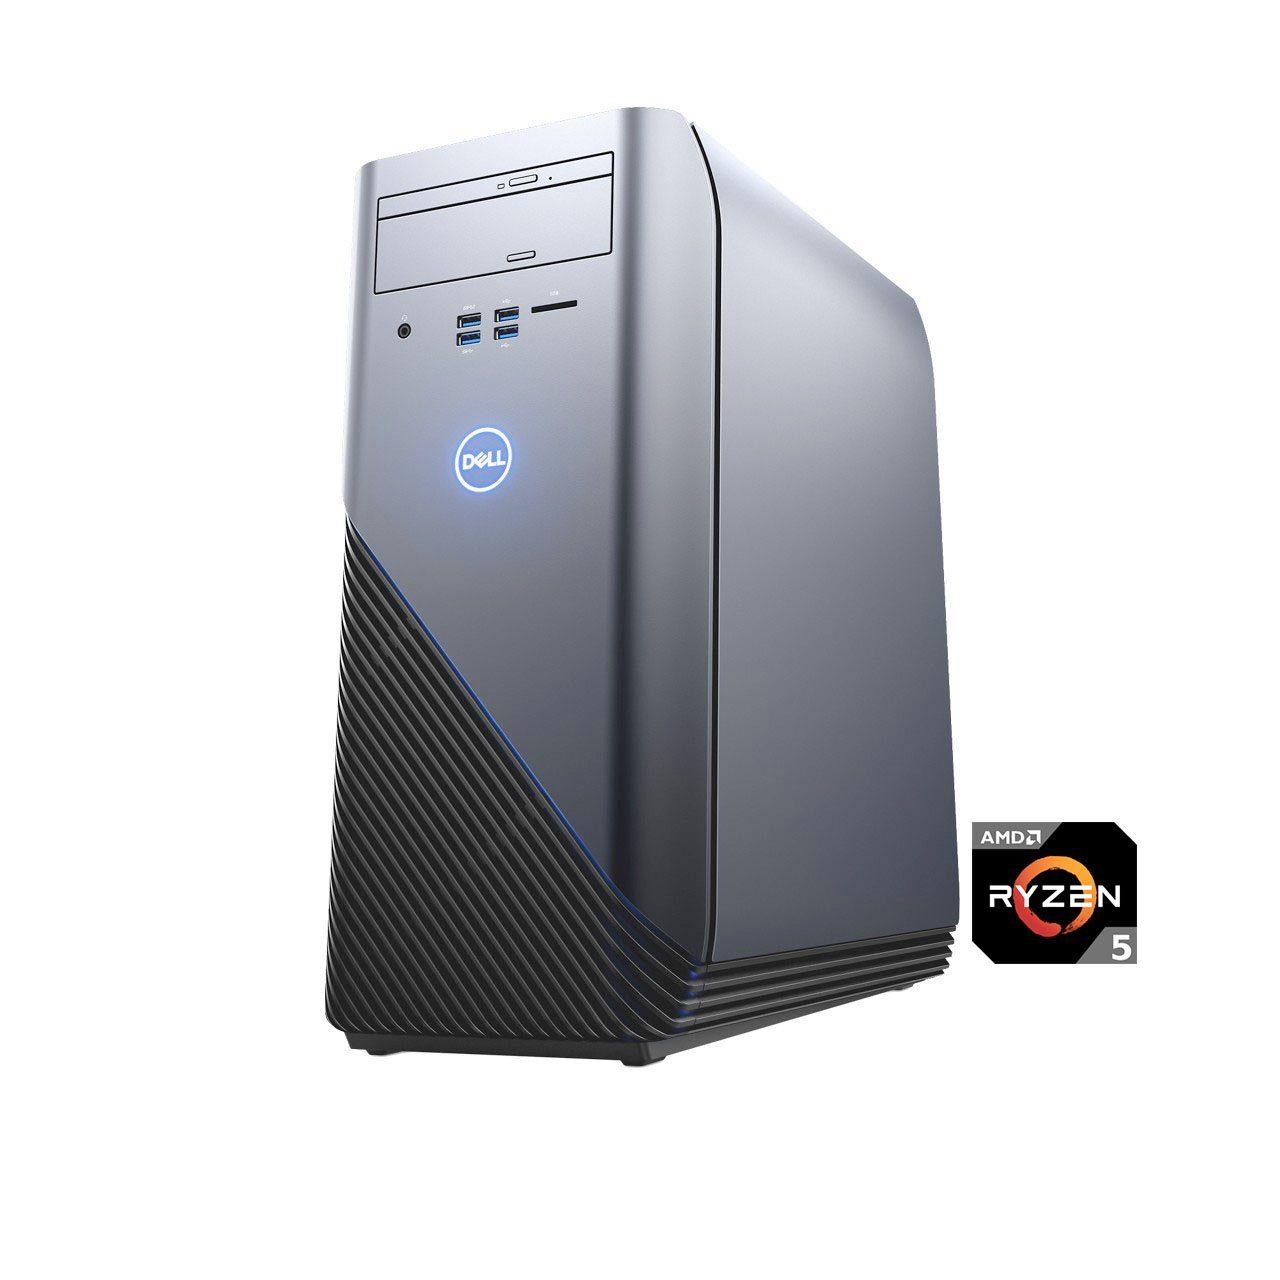 Dell EMC Desktop-PC »INSPIRON 5675 AMD R5-1400 4C8T«